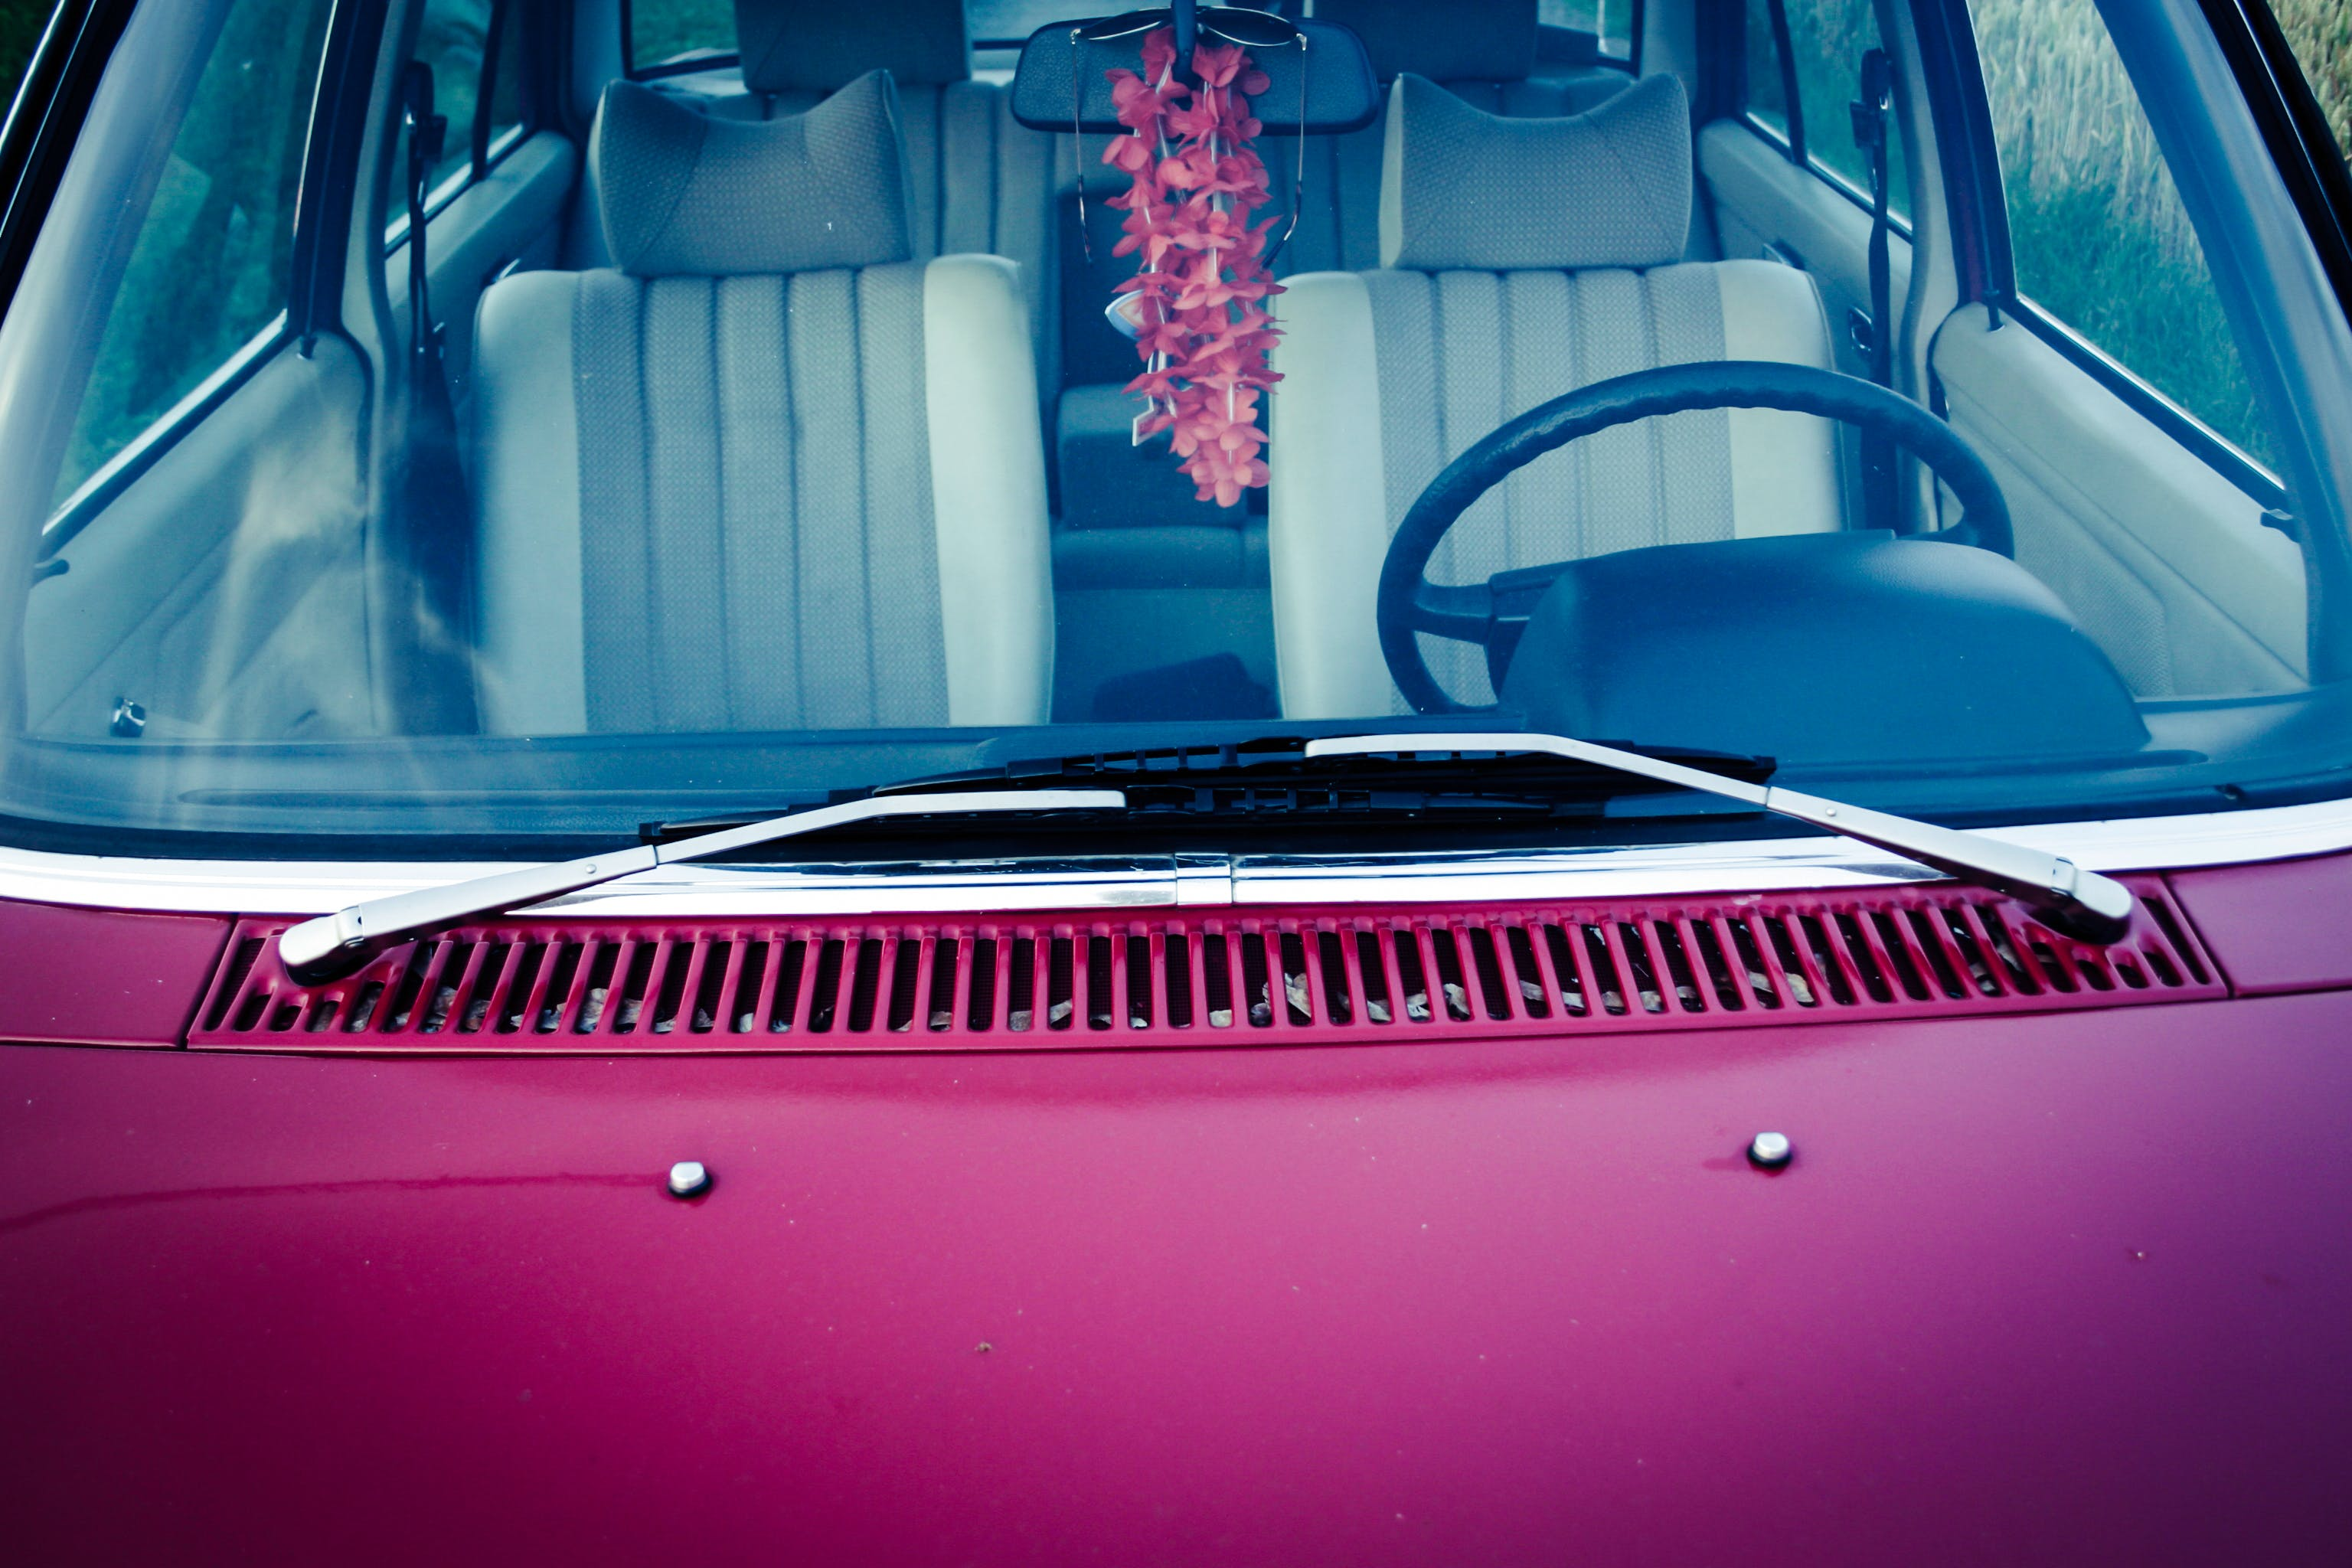 Purple Car Hood With Stainless Steel Window Wiper